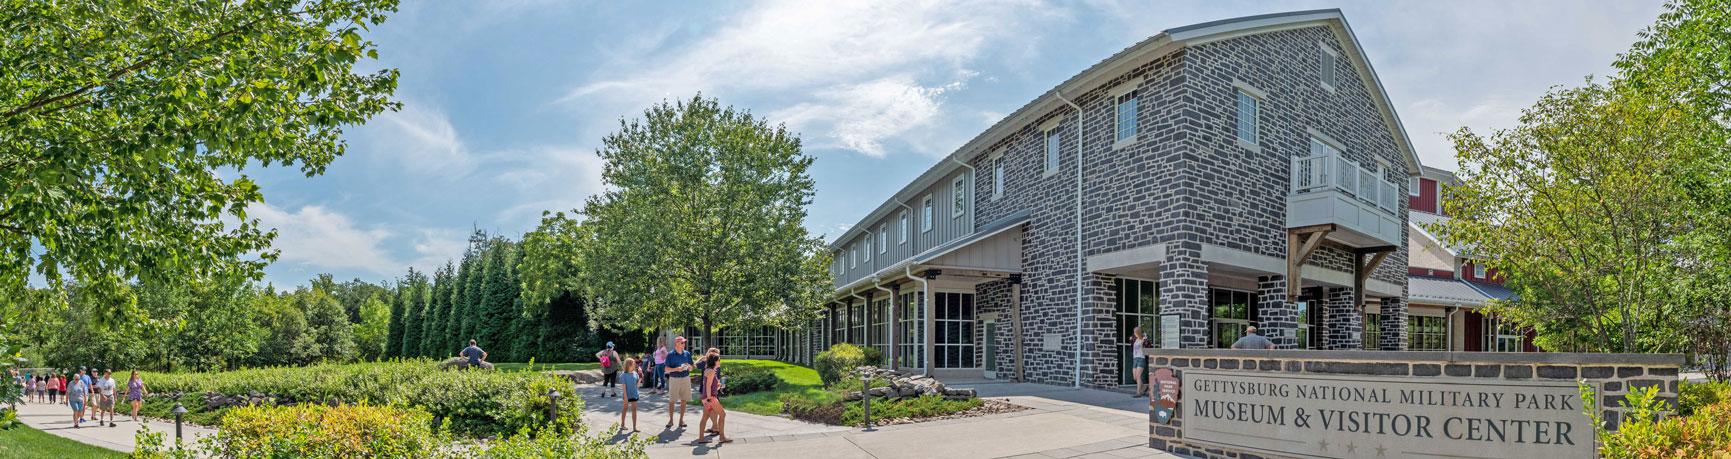 Gettysburg National Military Park Museum & Visitor Center